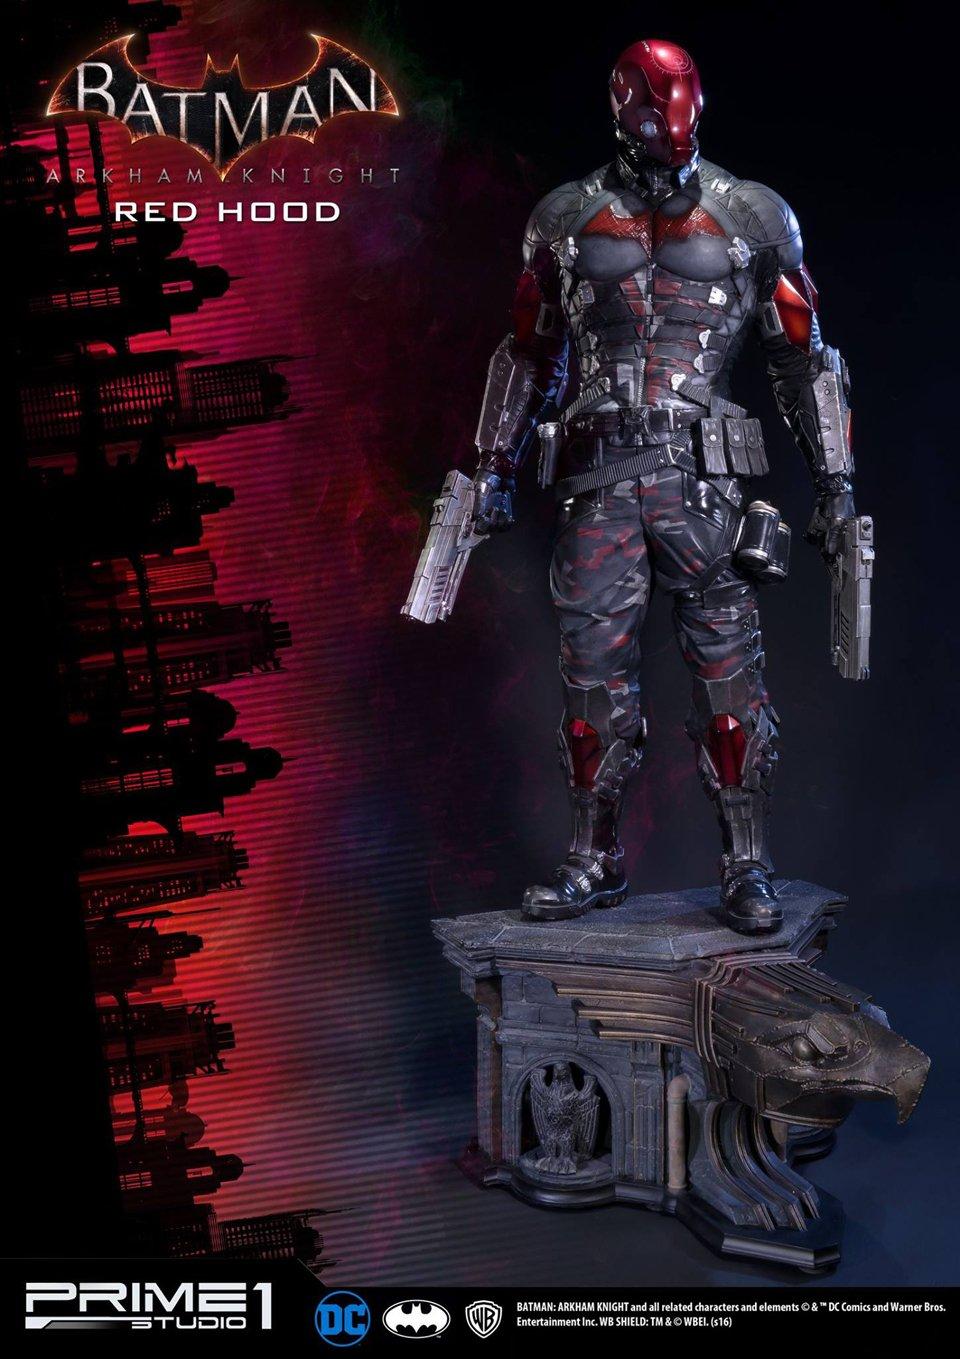 Prime 1 Batman: Arkham Knight Red Hood Statue